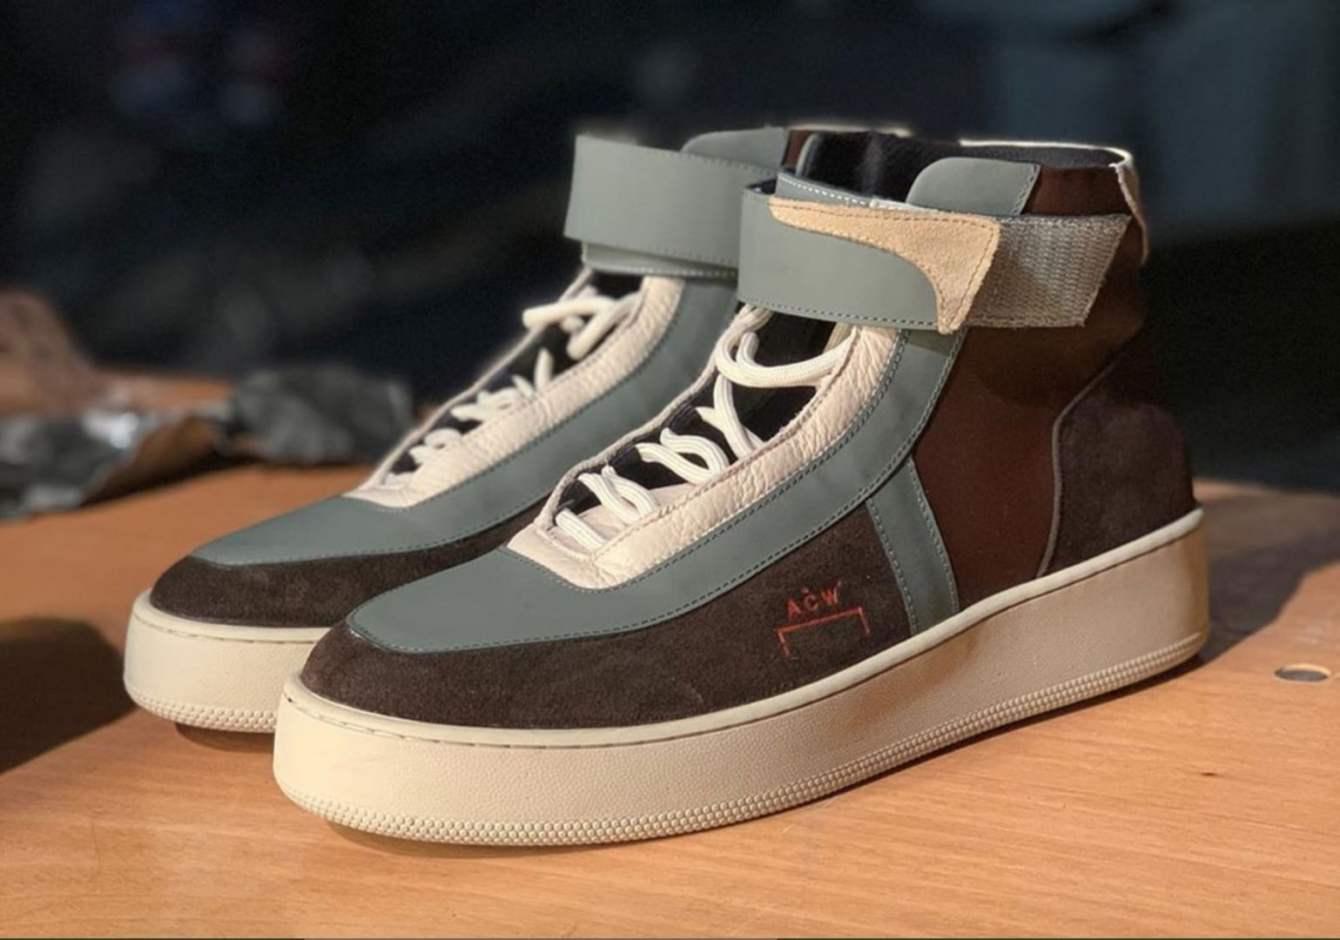 # A-COLD-WALL與Converse聯名:鞋跟變化會是未來的趨勢嗎? 2